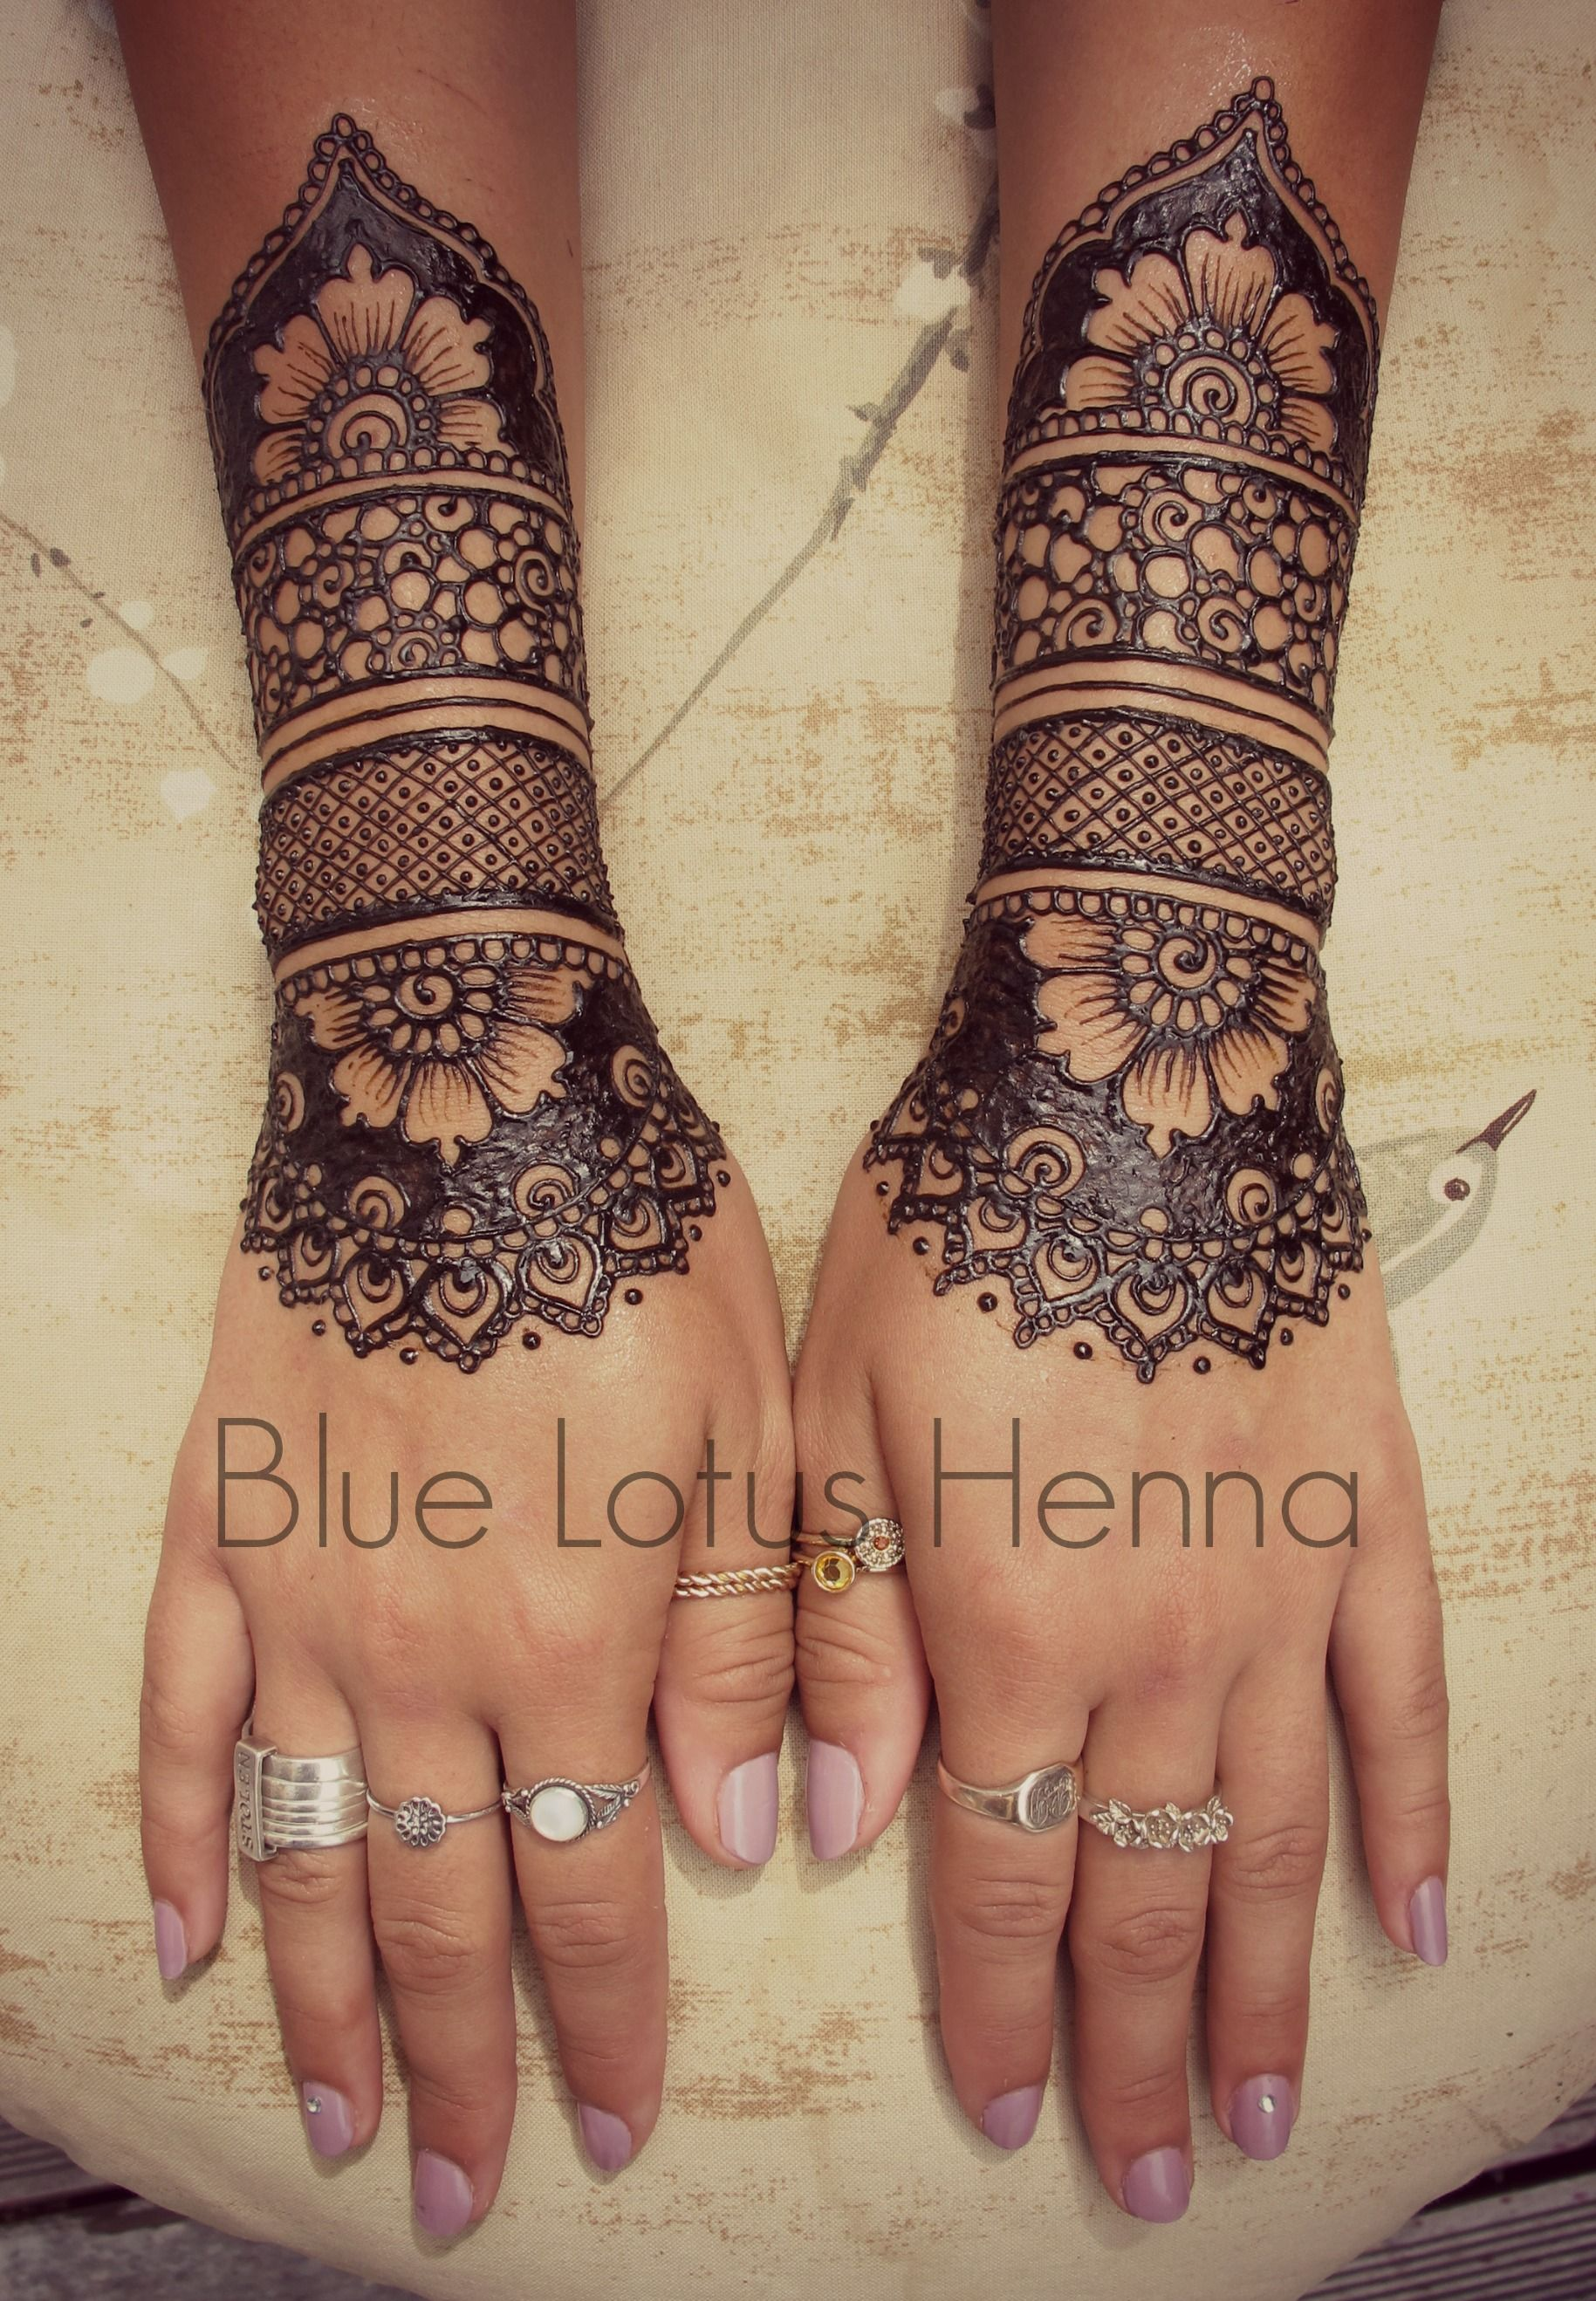 Wrist Cuff Henna Tattoos Mehndi: Alternative Bridal Cuffs.... If You Like This Then Check